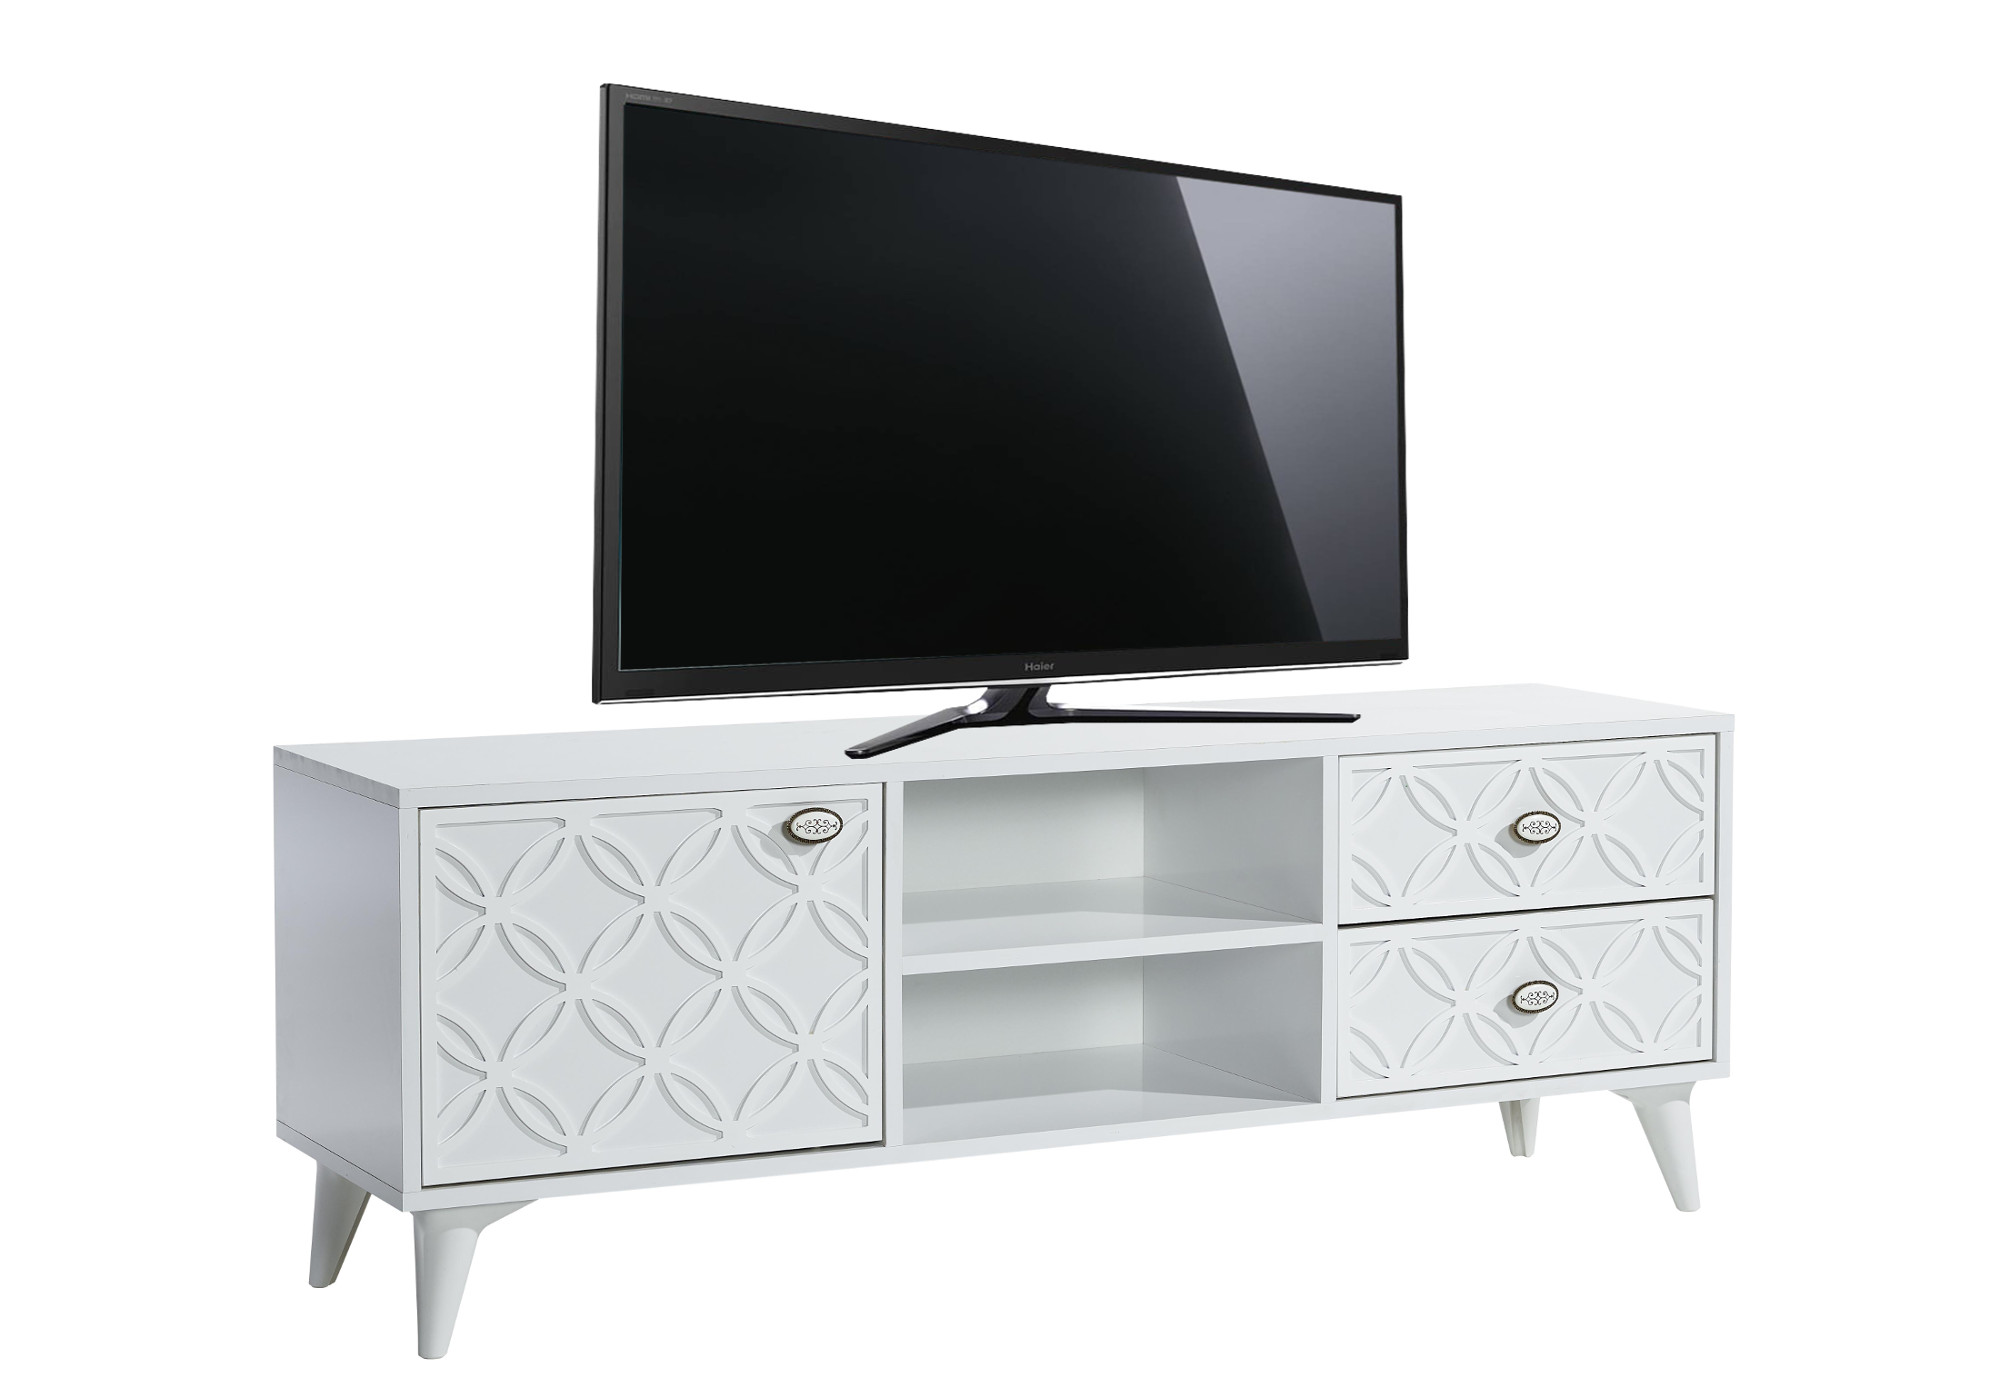 meuble tv haut decor blanc flix